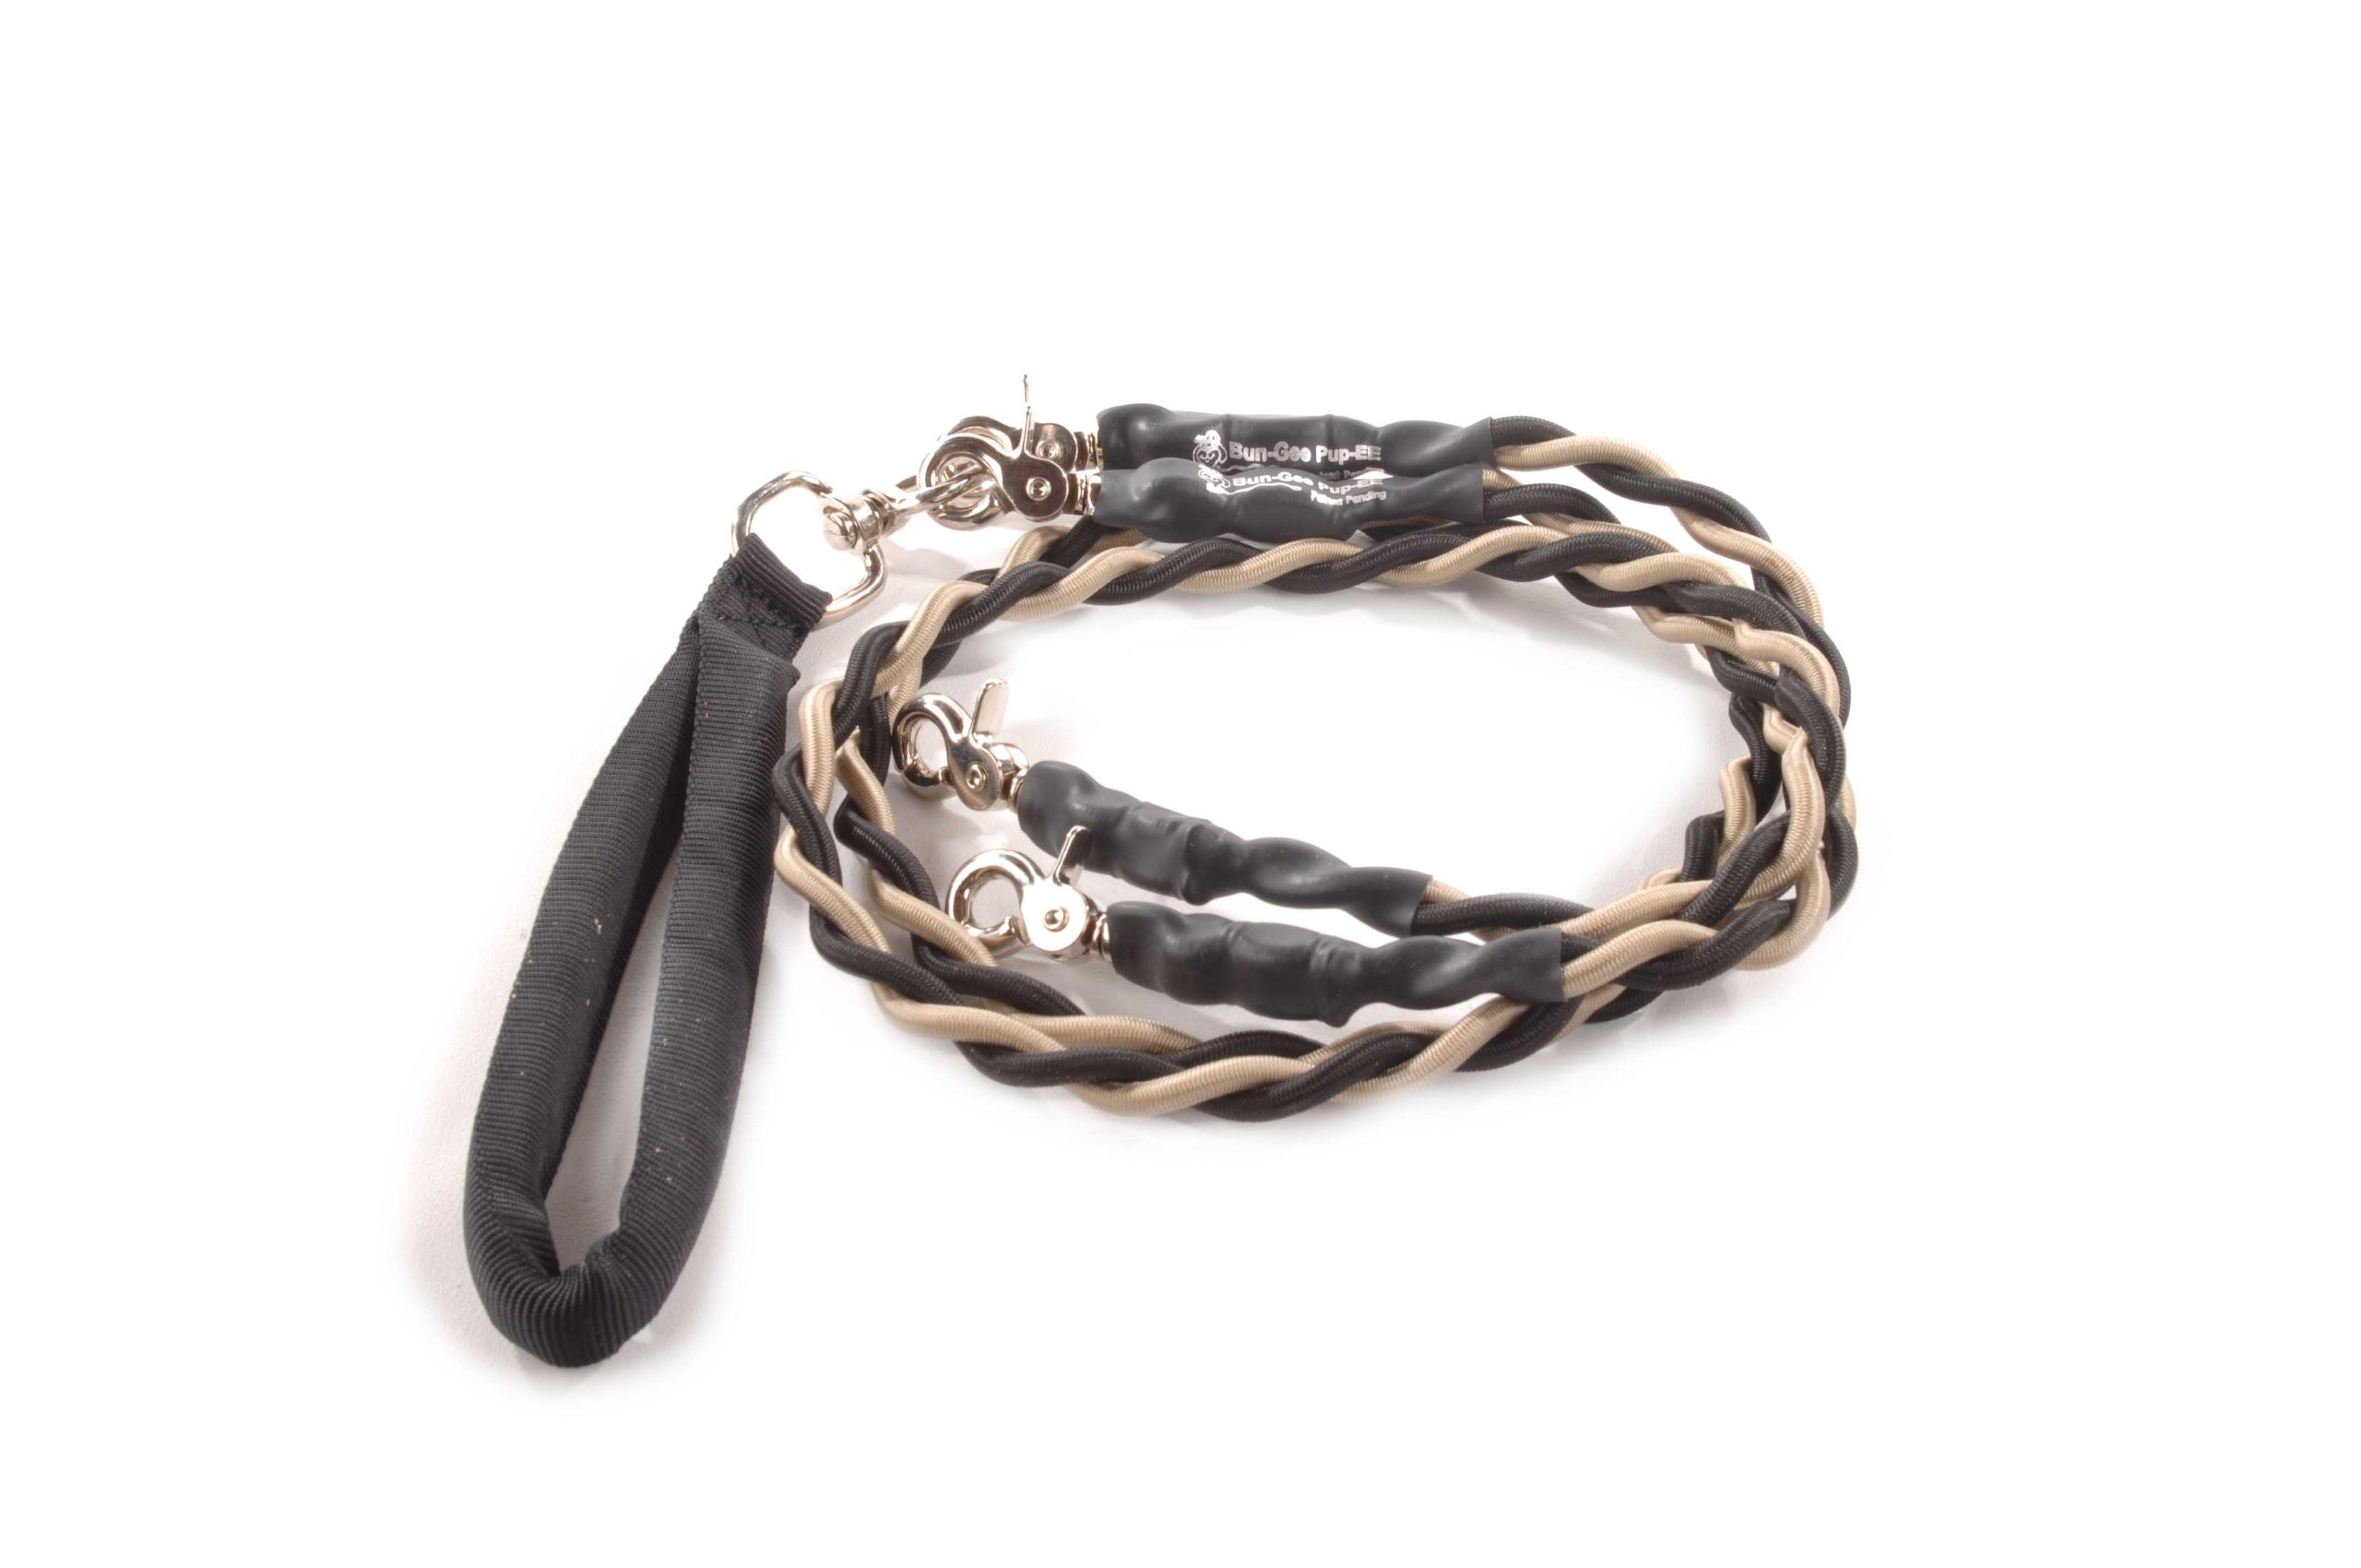 Bungee Pupee 4-Feet Double Pet Leash for Medium Sized Dogs, Grey/Black